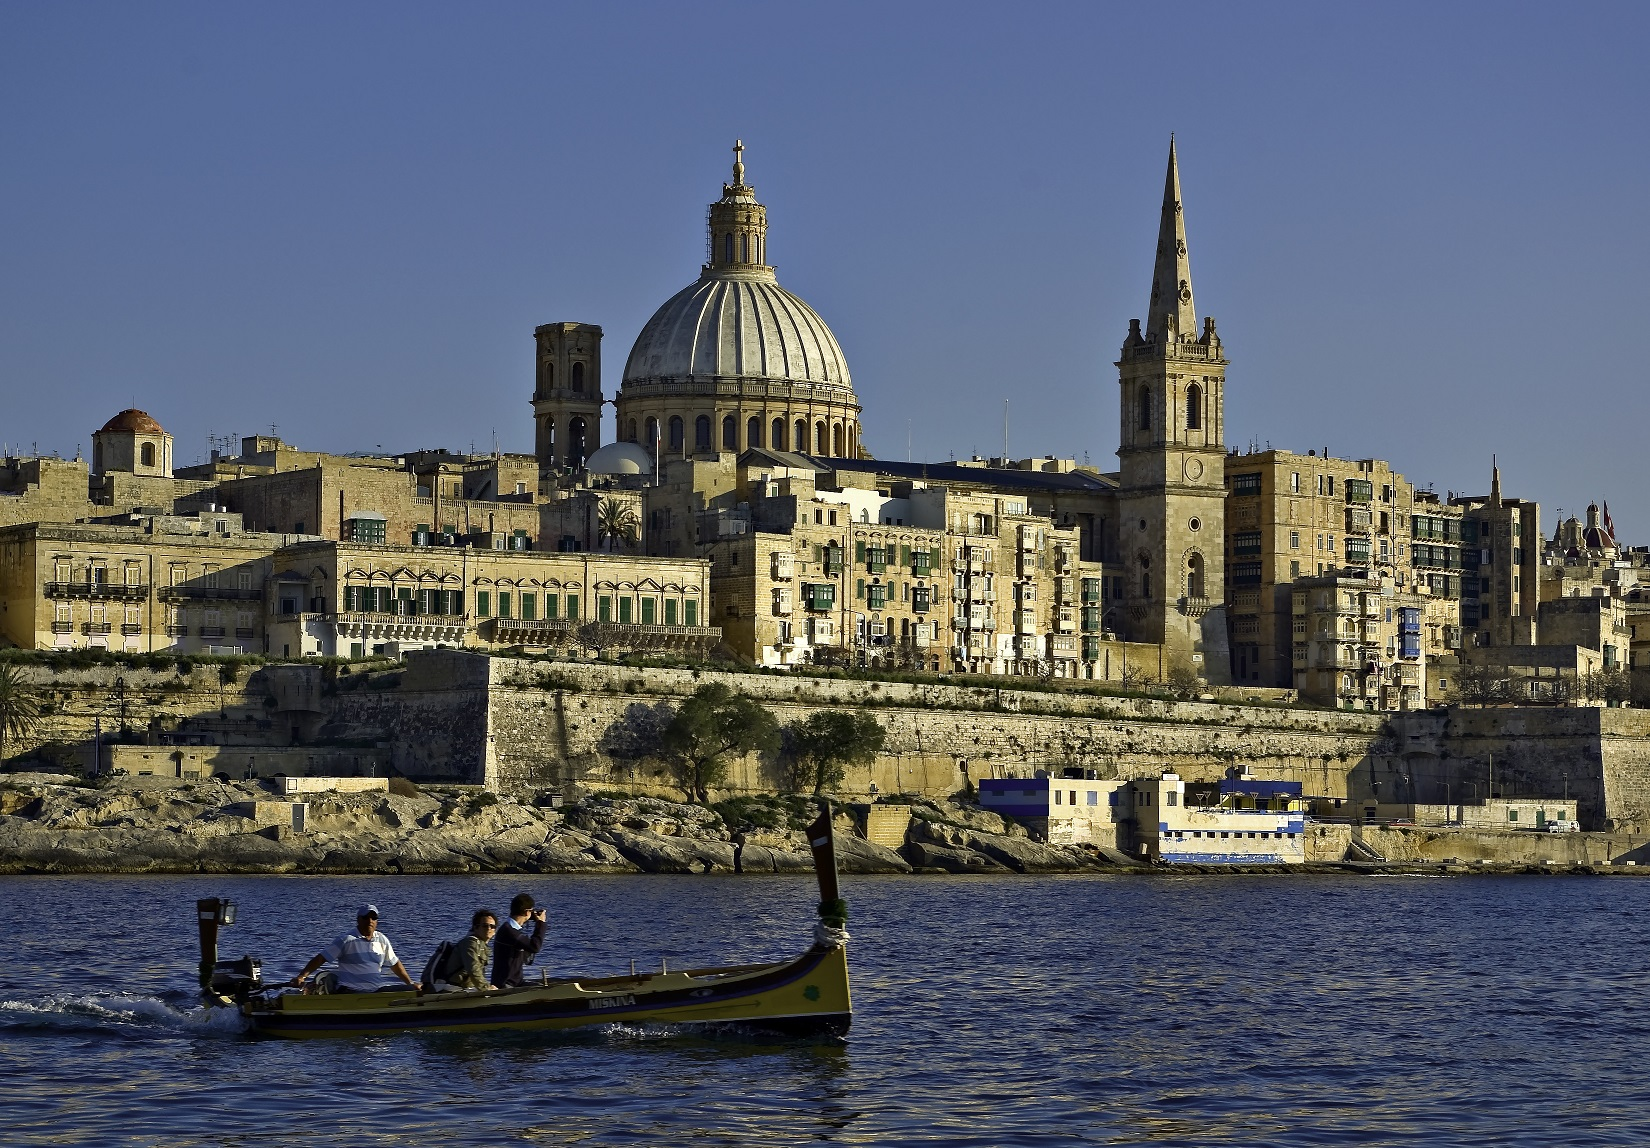 Malta - Valletta from Marsamxett Harbour 01 by Clive Vella